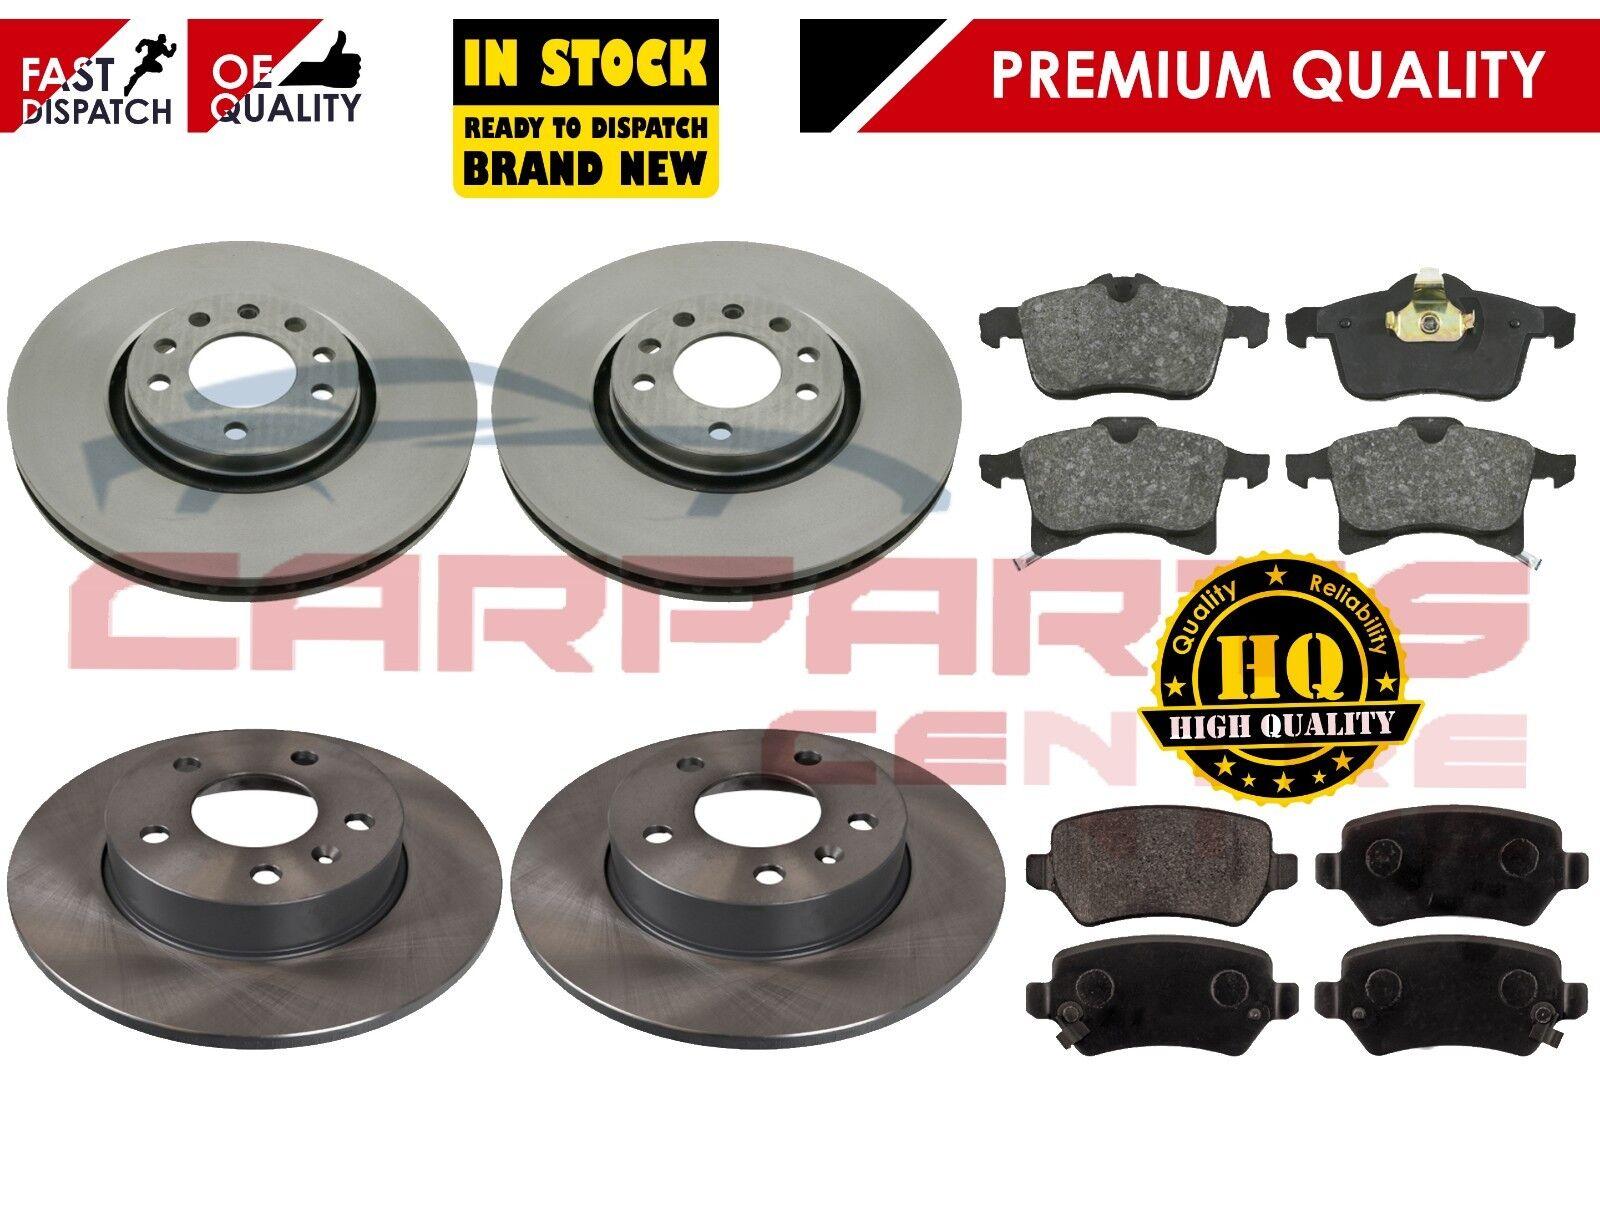 For Vauxhall Zafira MK2 2005-2011 Rear Brake Discs /& Brake Pads NEW